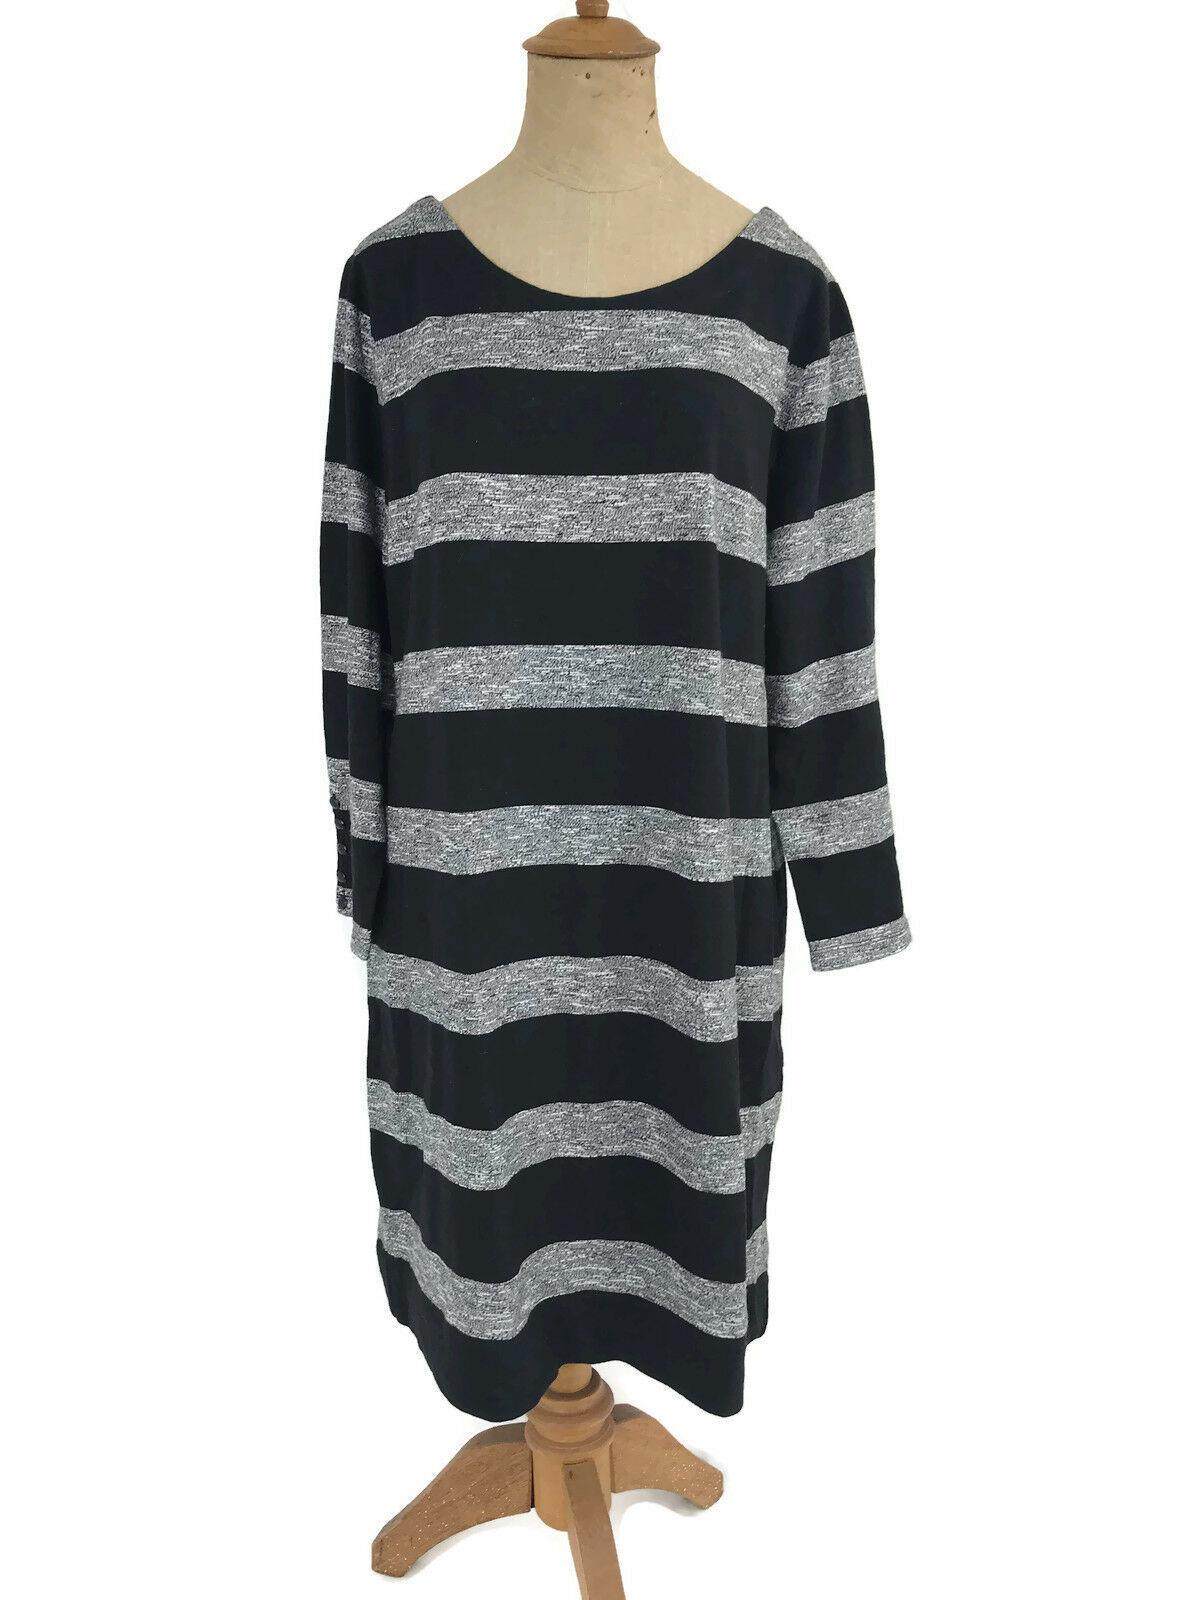 J. Crew Factory Dress Black Gray Stripe Boatneck 3/4 Sleeves Style 02665 Sz L U1